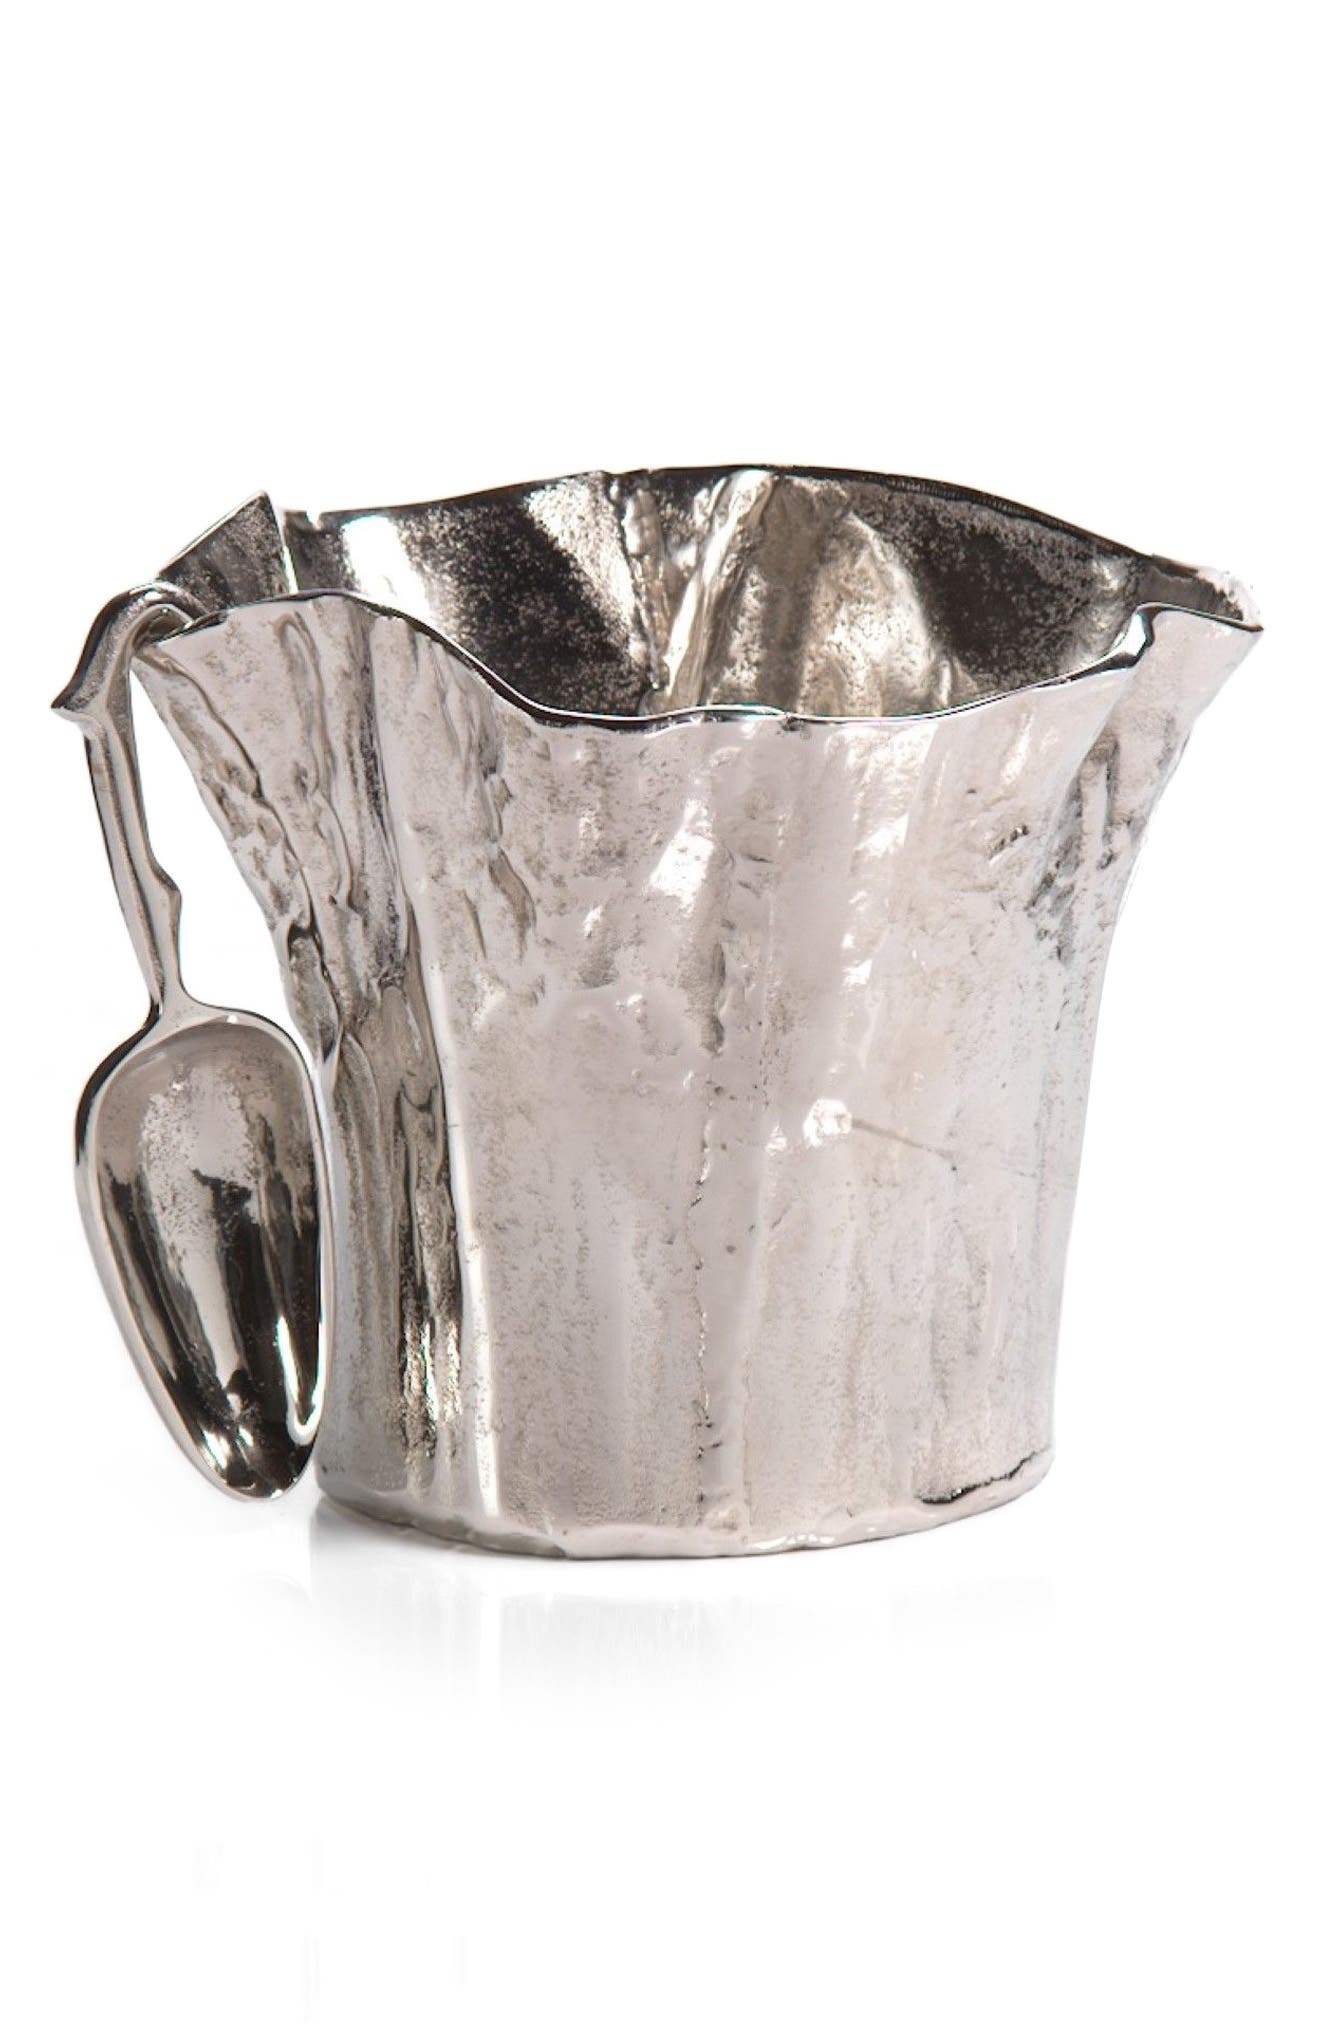 Cado Ice Bucket & Ice Scoop,                             Main thumbnail 1, color,                             040